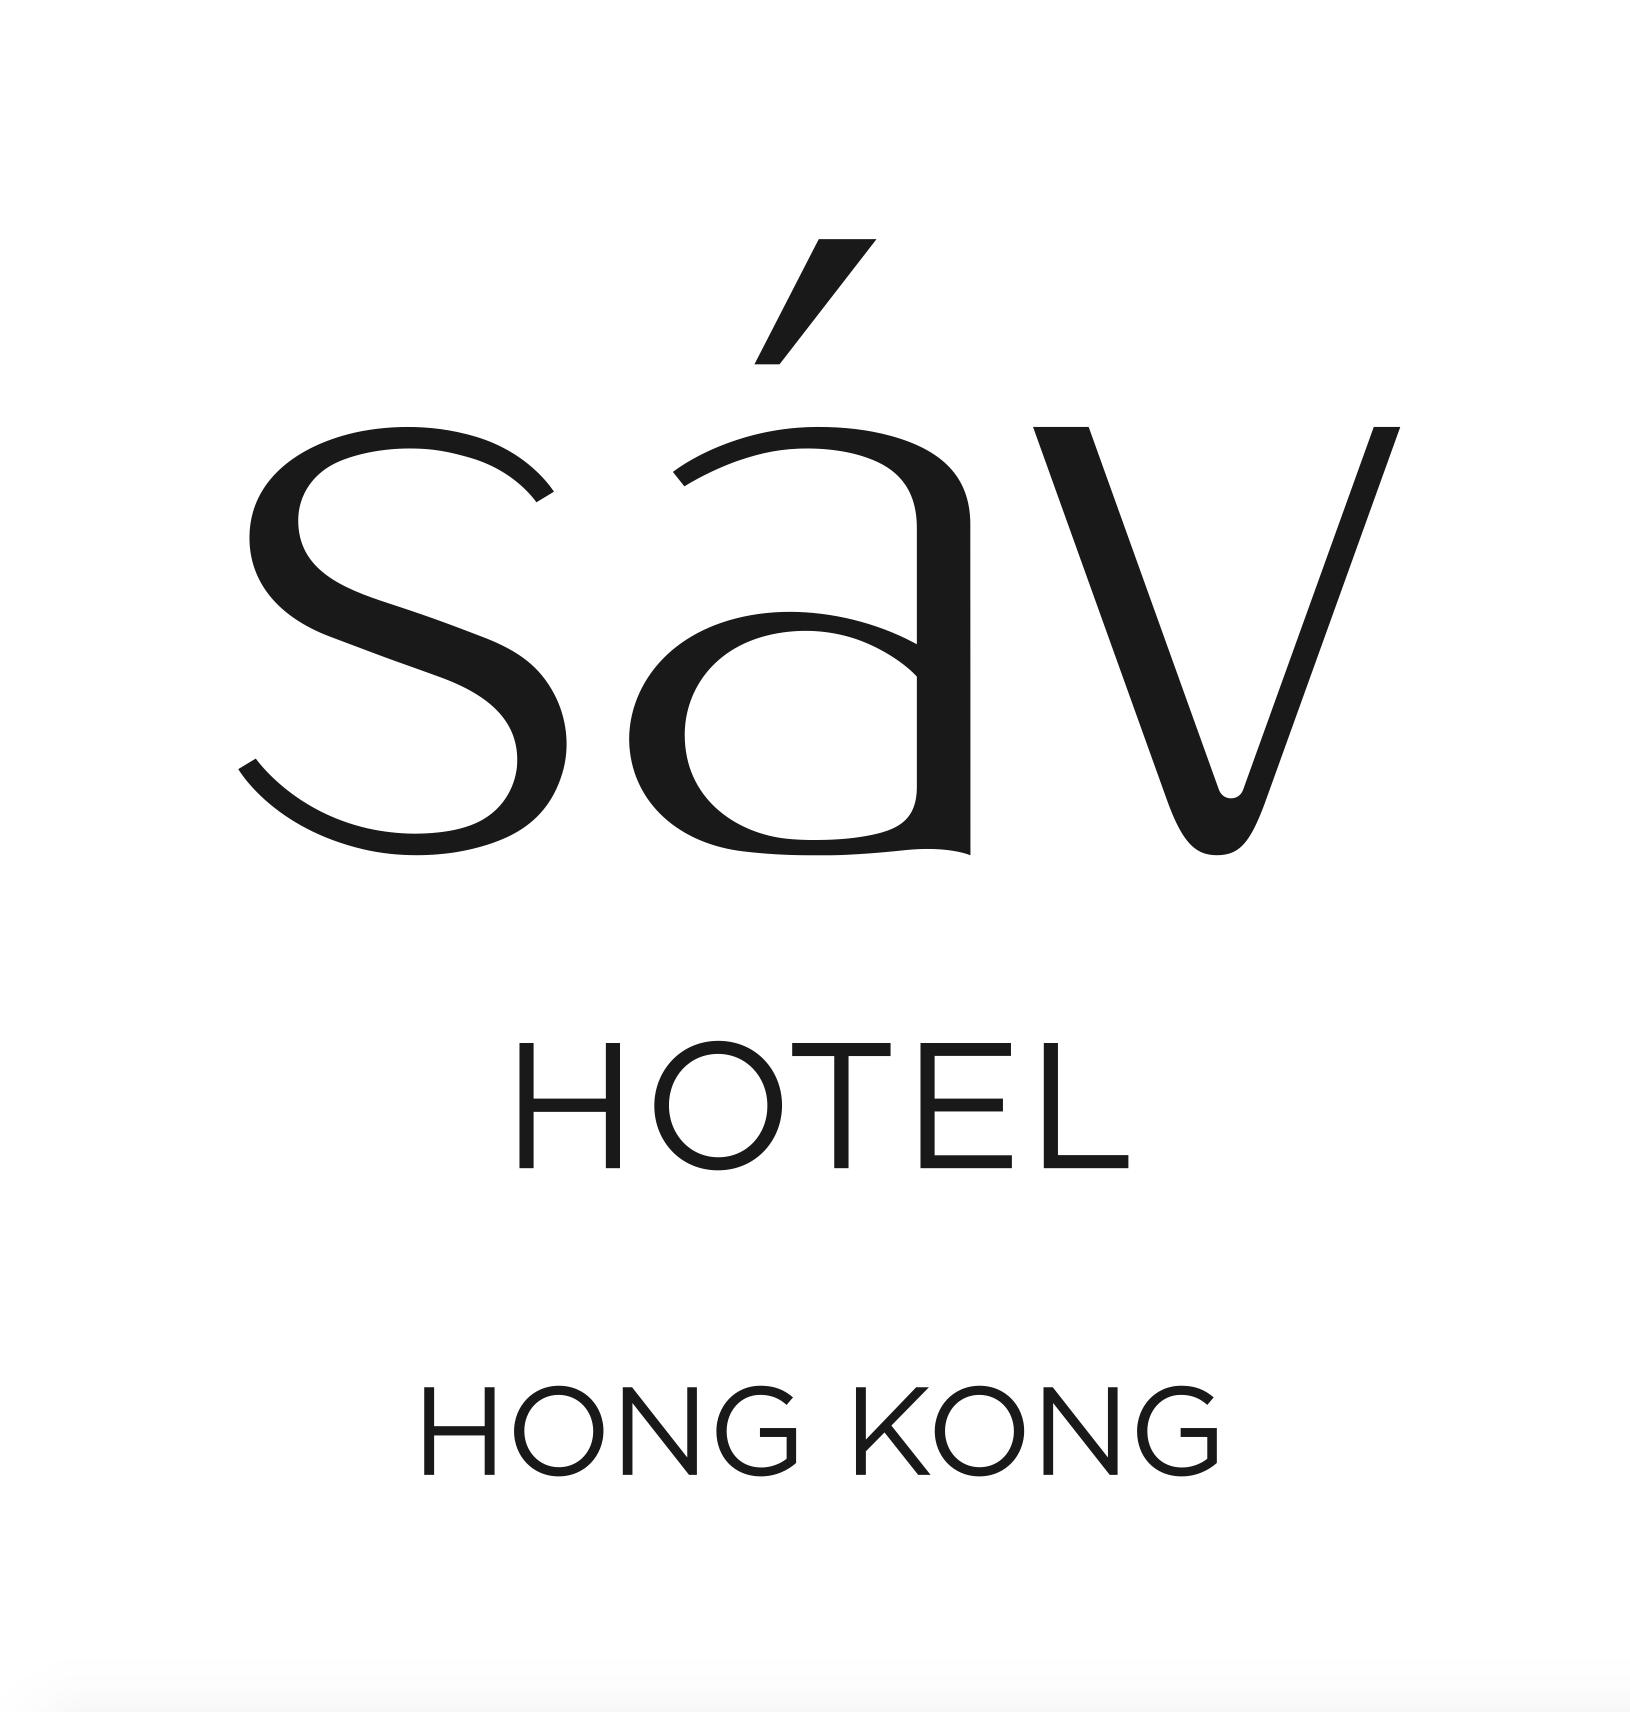 Hotel Sav.png